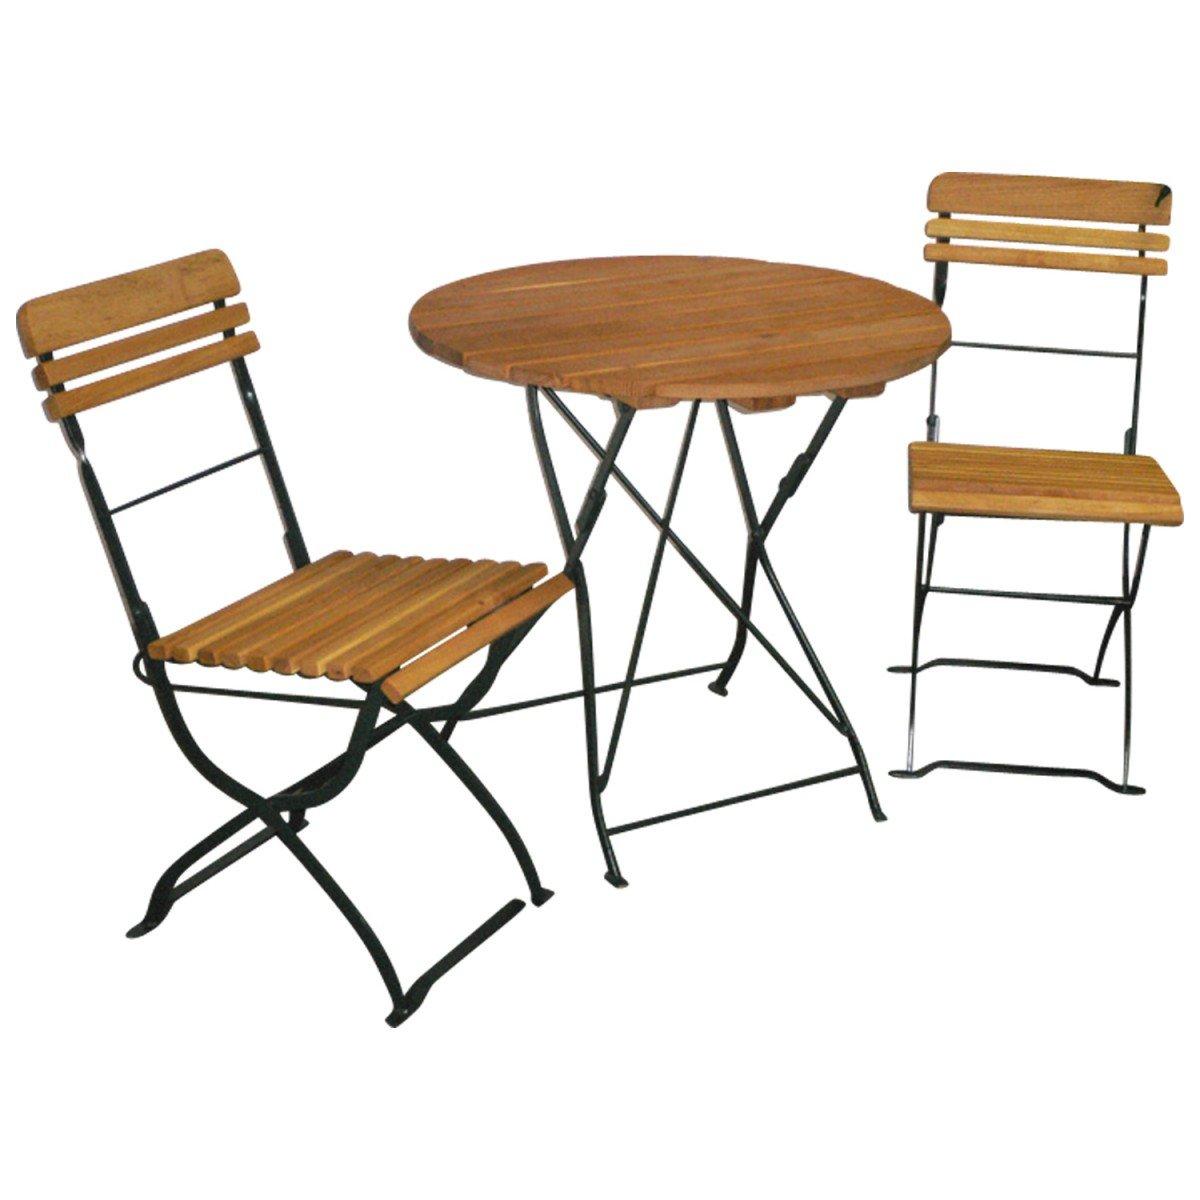 gartengruppe gartenm bel set 3 tlg balkongruppe garten. Black Bedroom Furniture Sets. Home Design Ideas